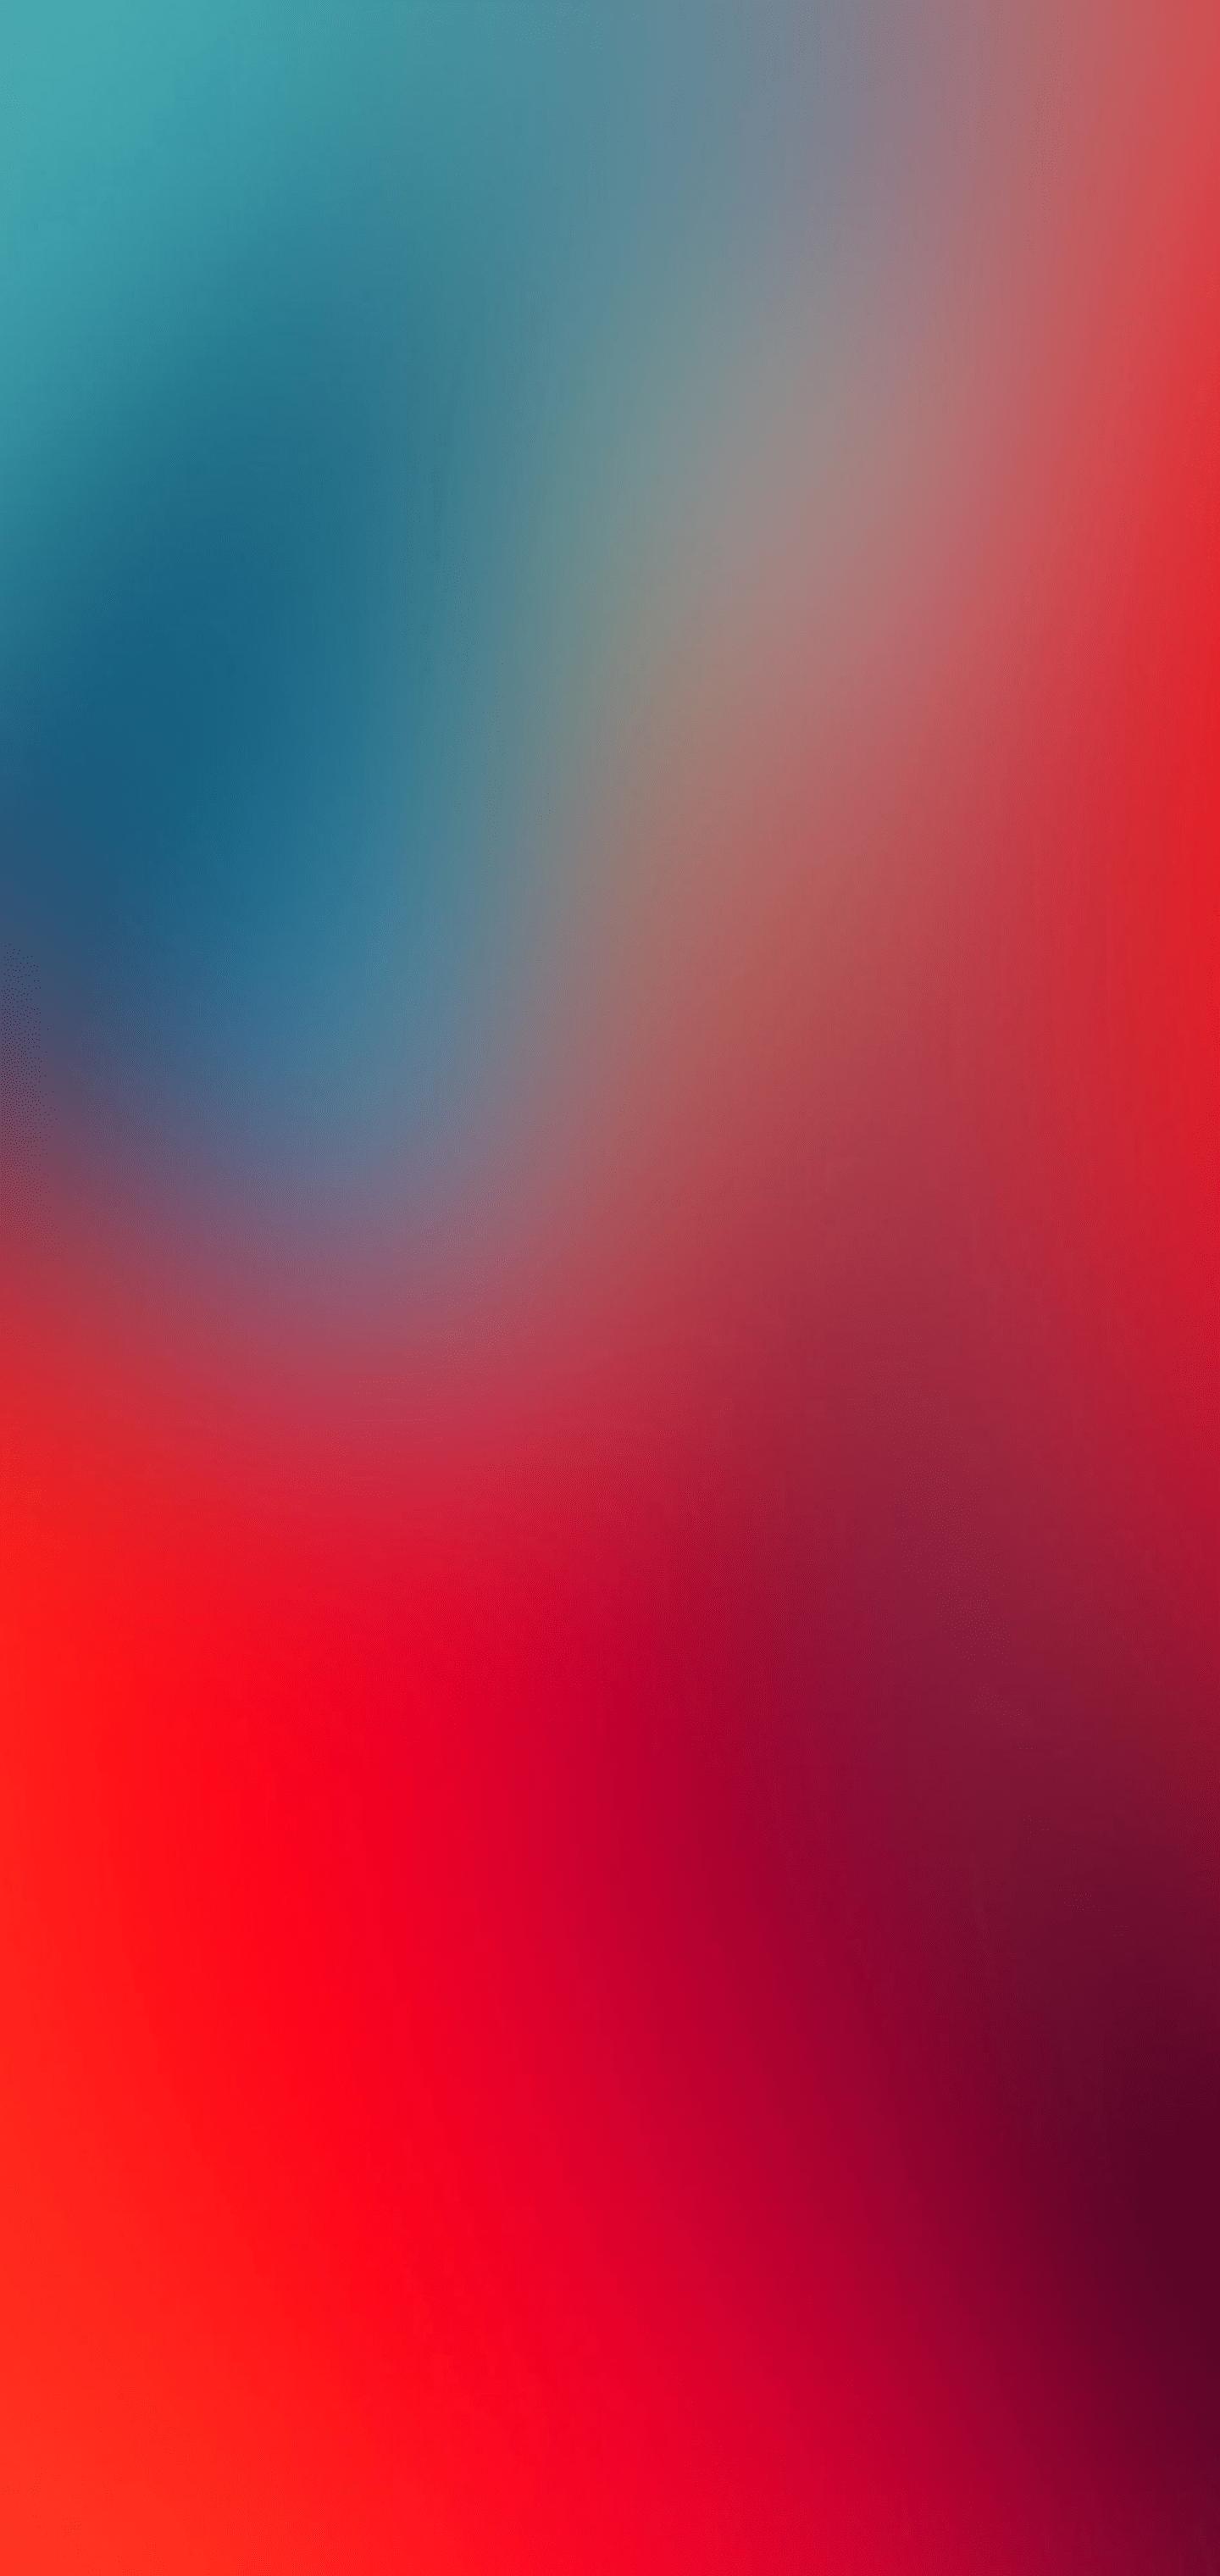 1440x3040 Hình nền iPhone 12